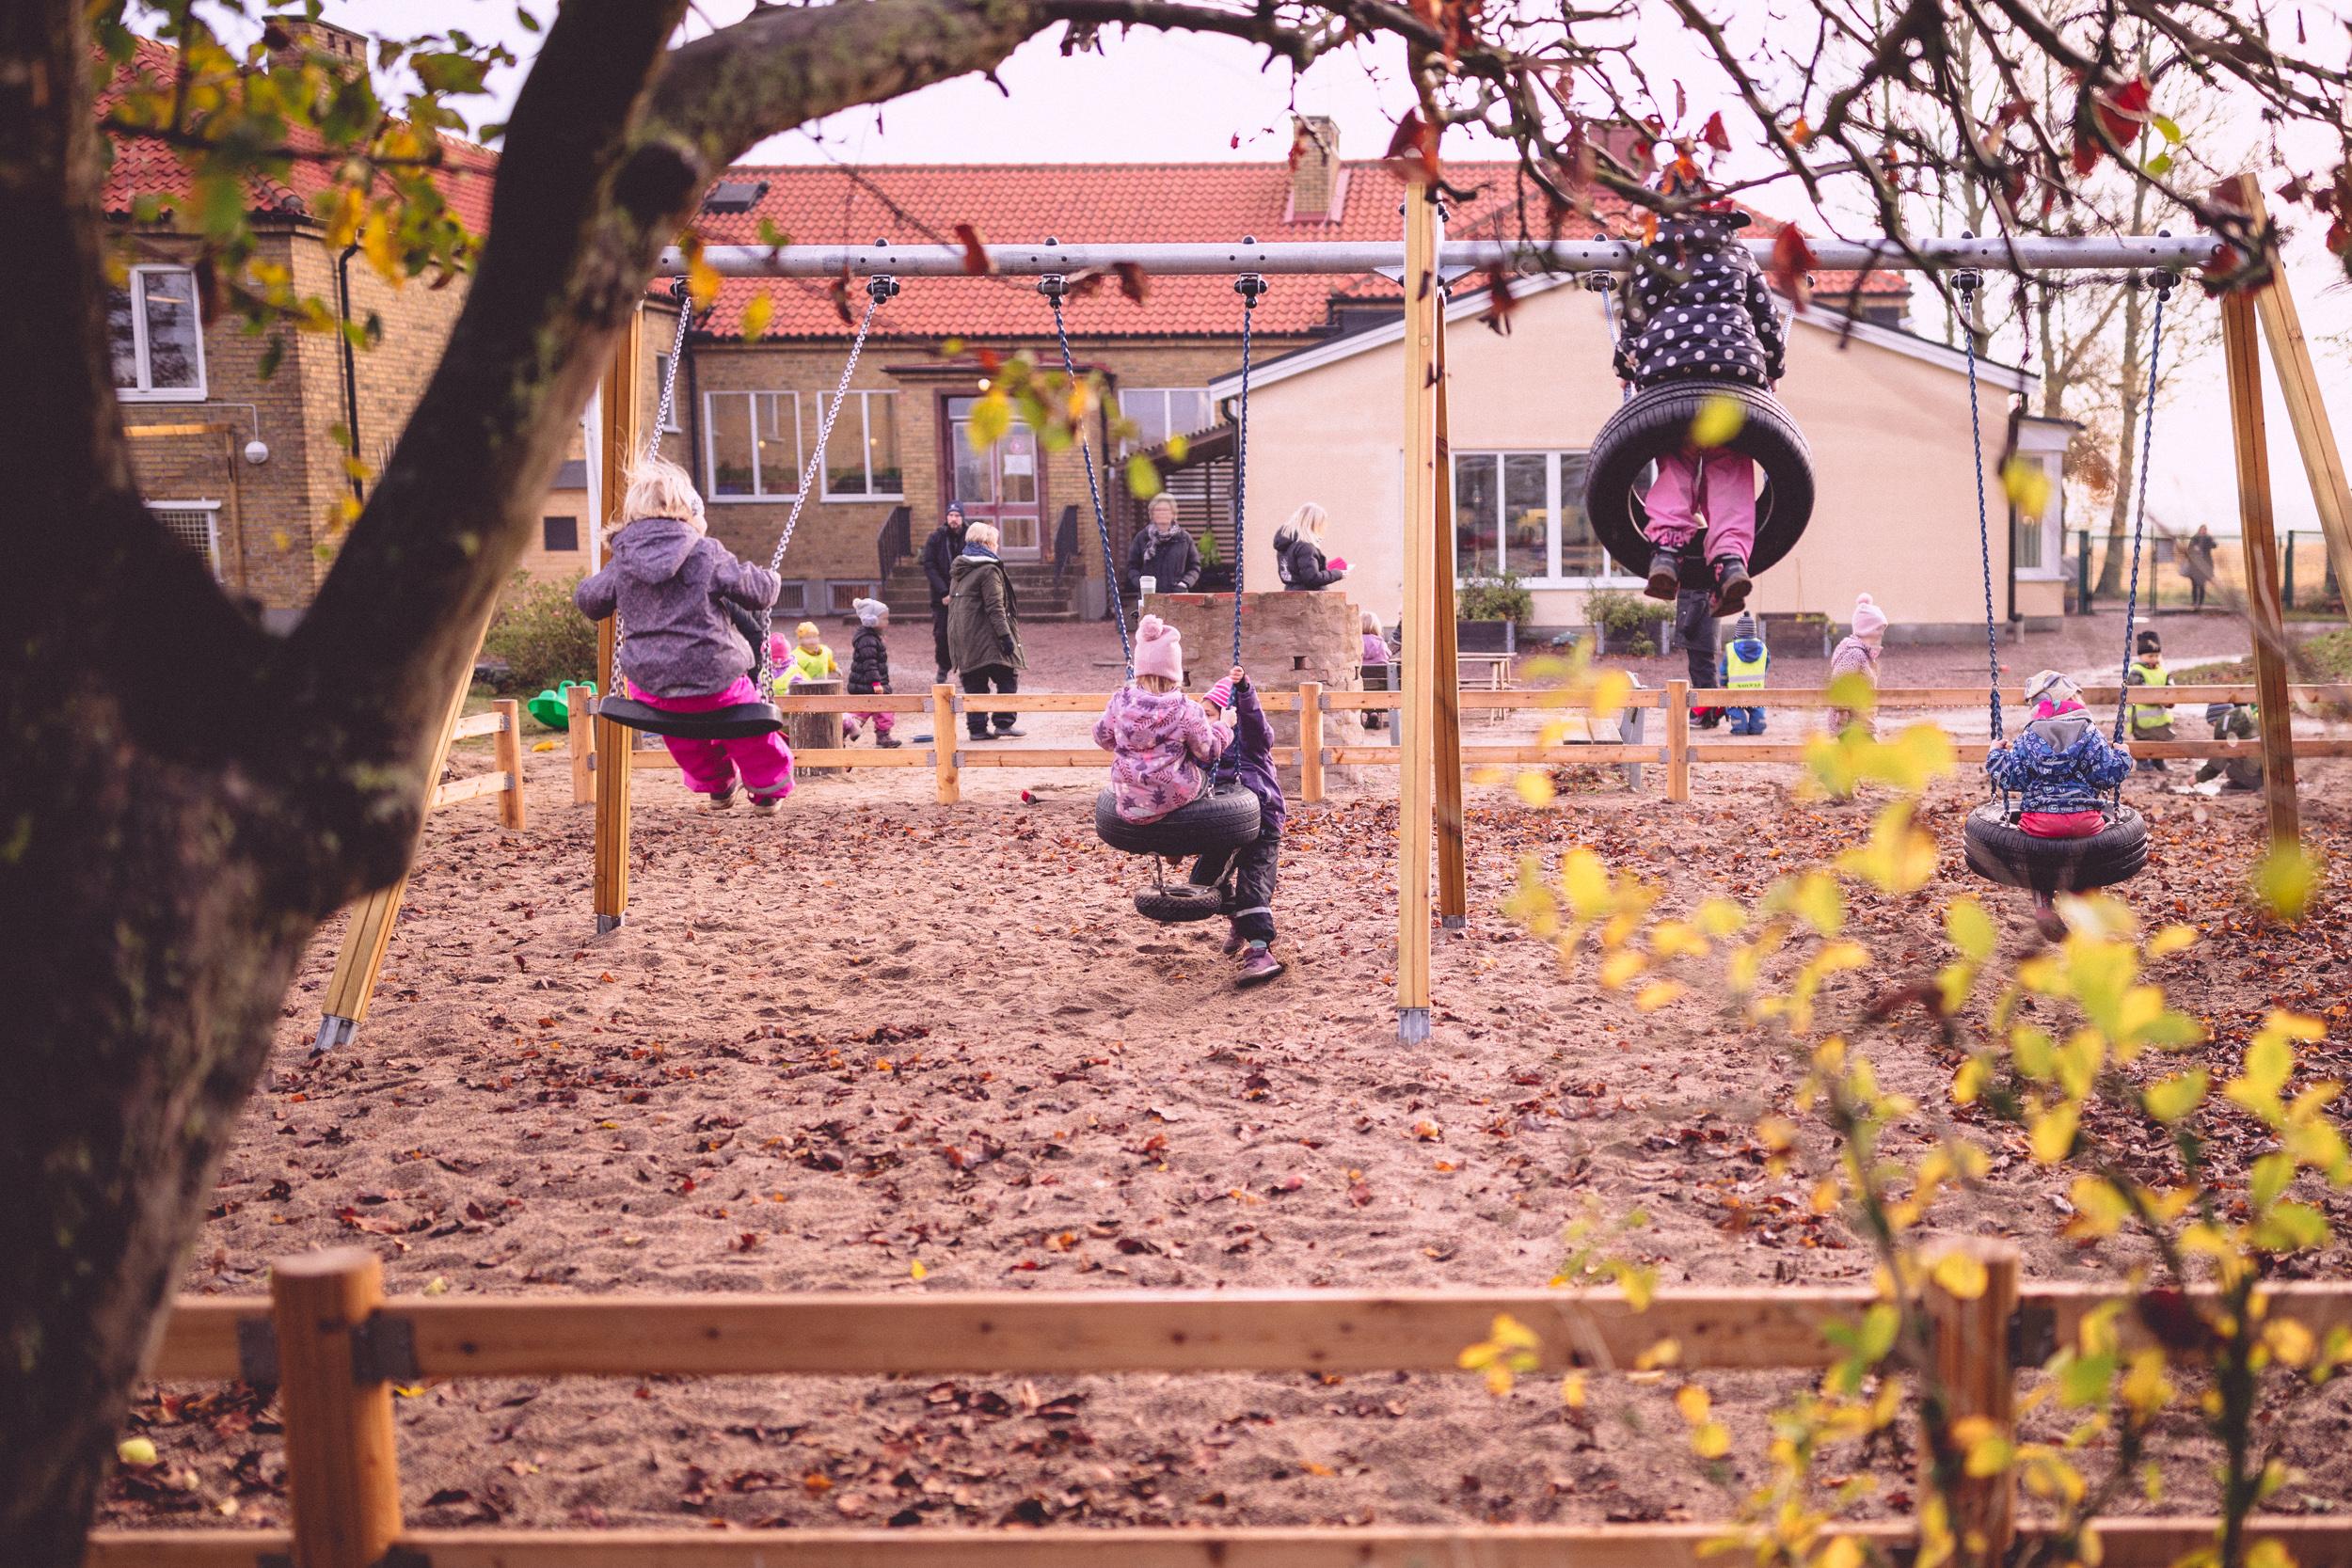 Pilens Montessoriskola